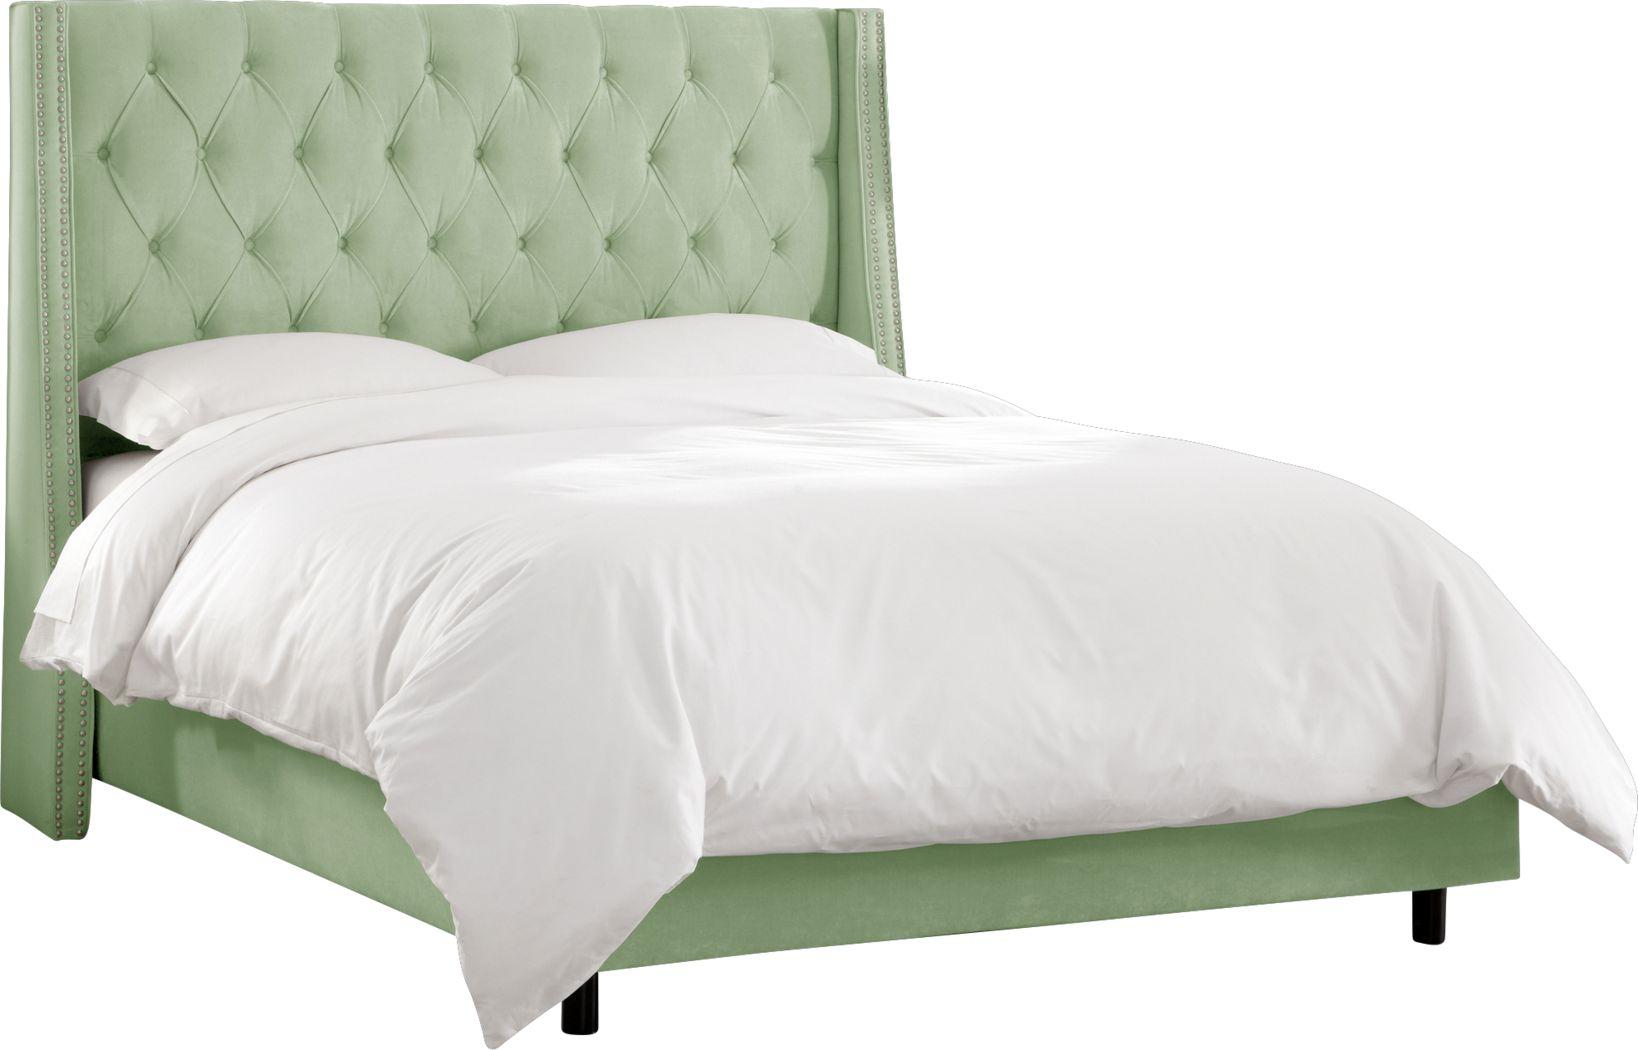 Garonne Green Twin Bed